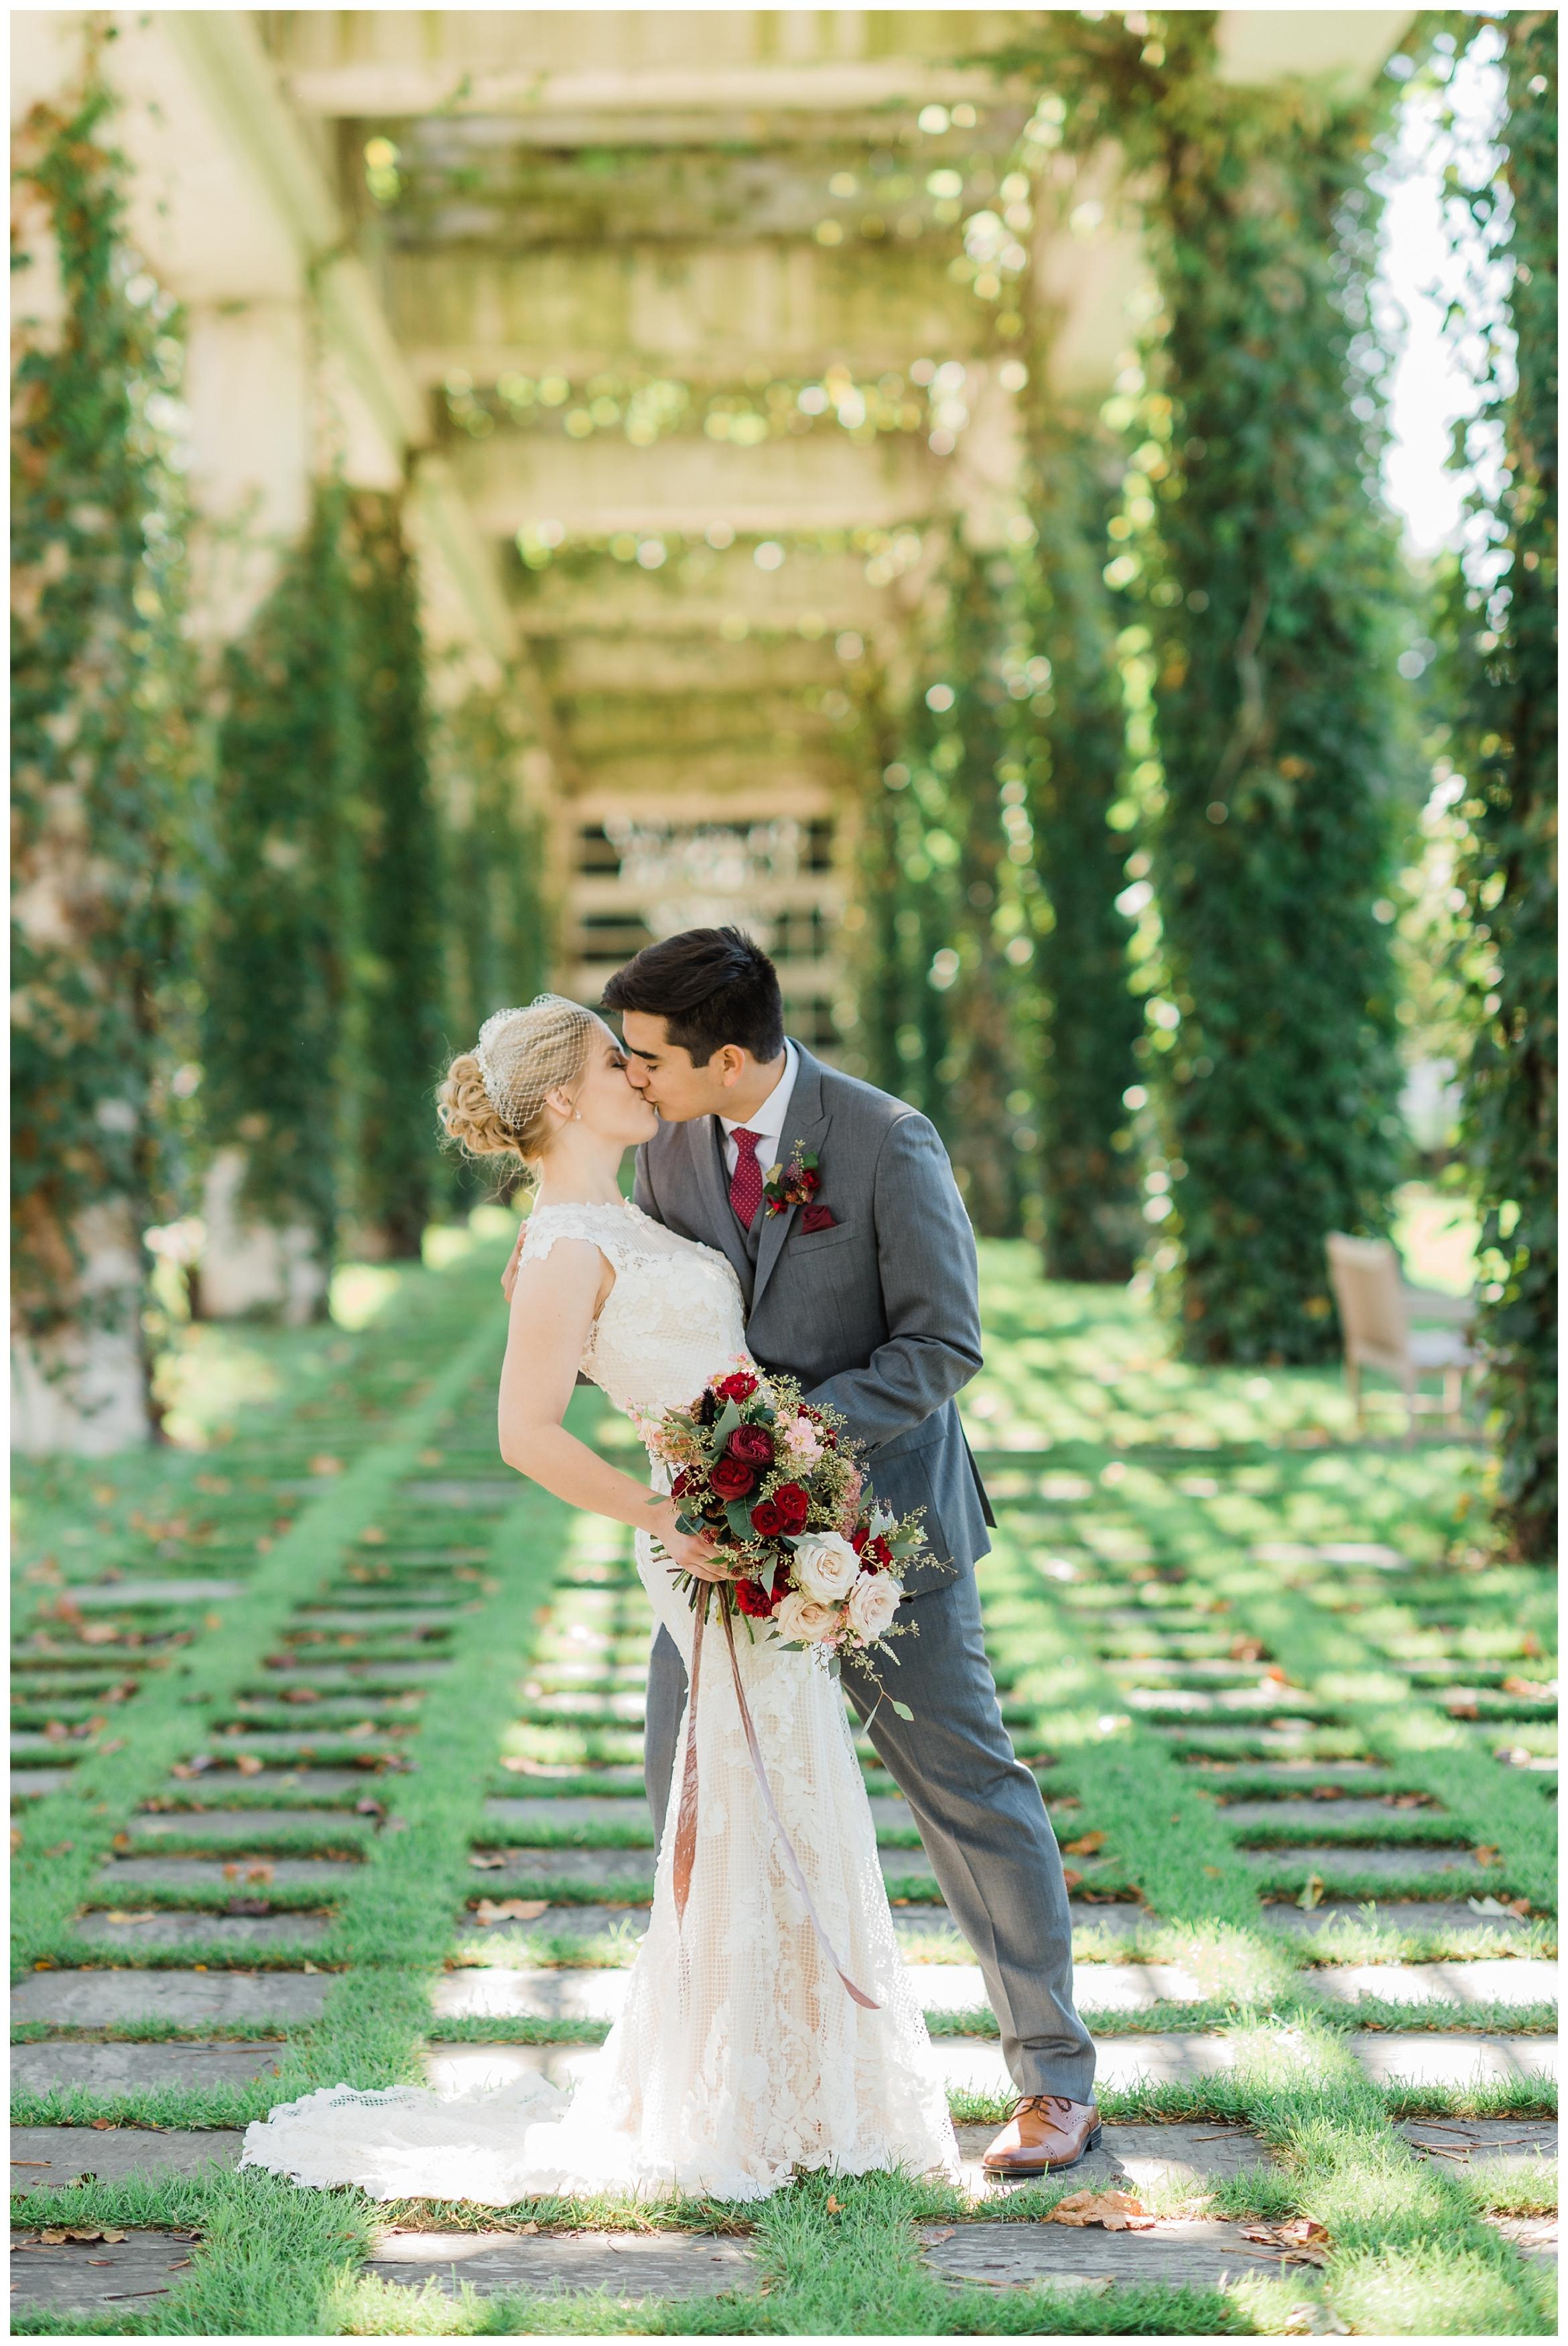 Rebecca_Shehorn_Photography_Indianapolis_Wedding_Photographer_7335.jpg